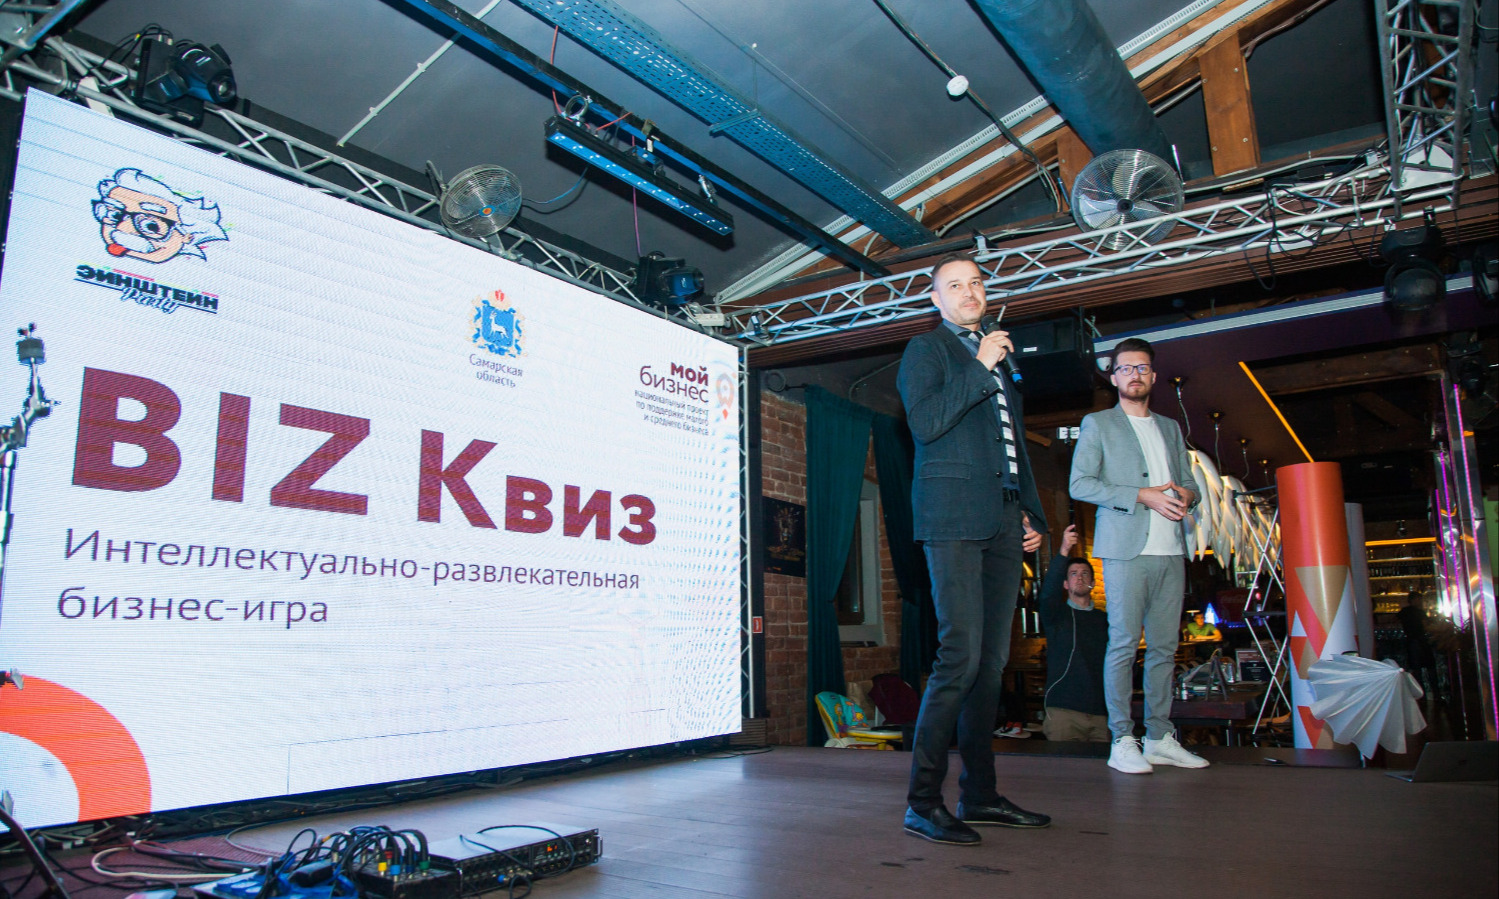 Бизнес-викторина BIZ-квиз 23 сентября 2019 г